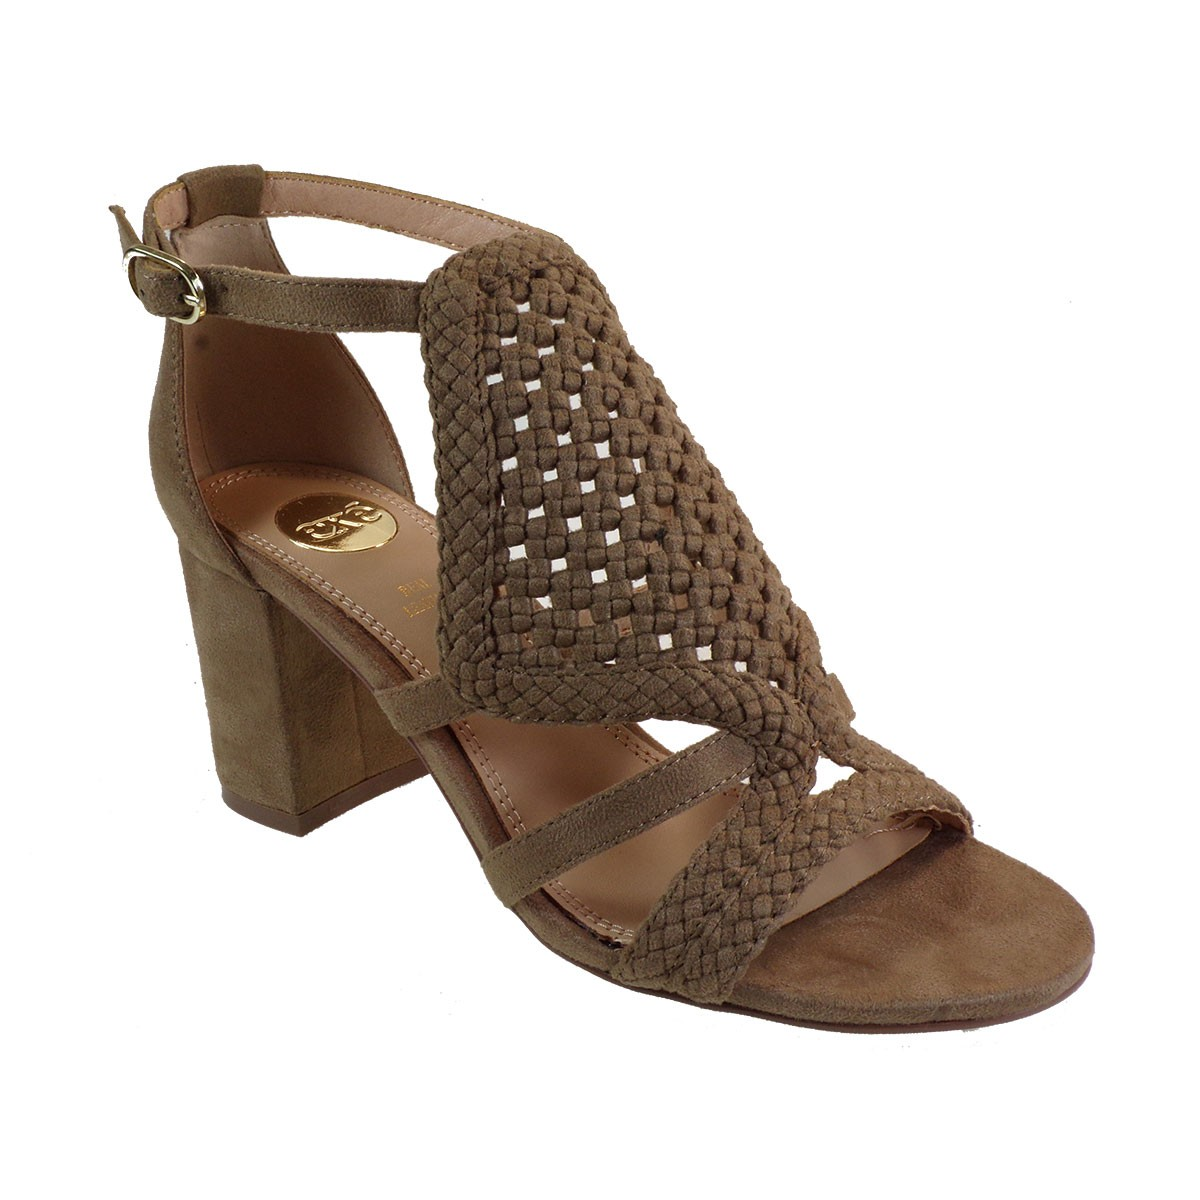 EXE Shoes Πέδιλα Γυναικεία ADELE-655 Πούρο Καστόρι K47006554541